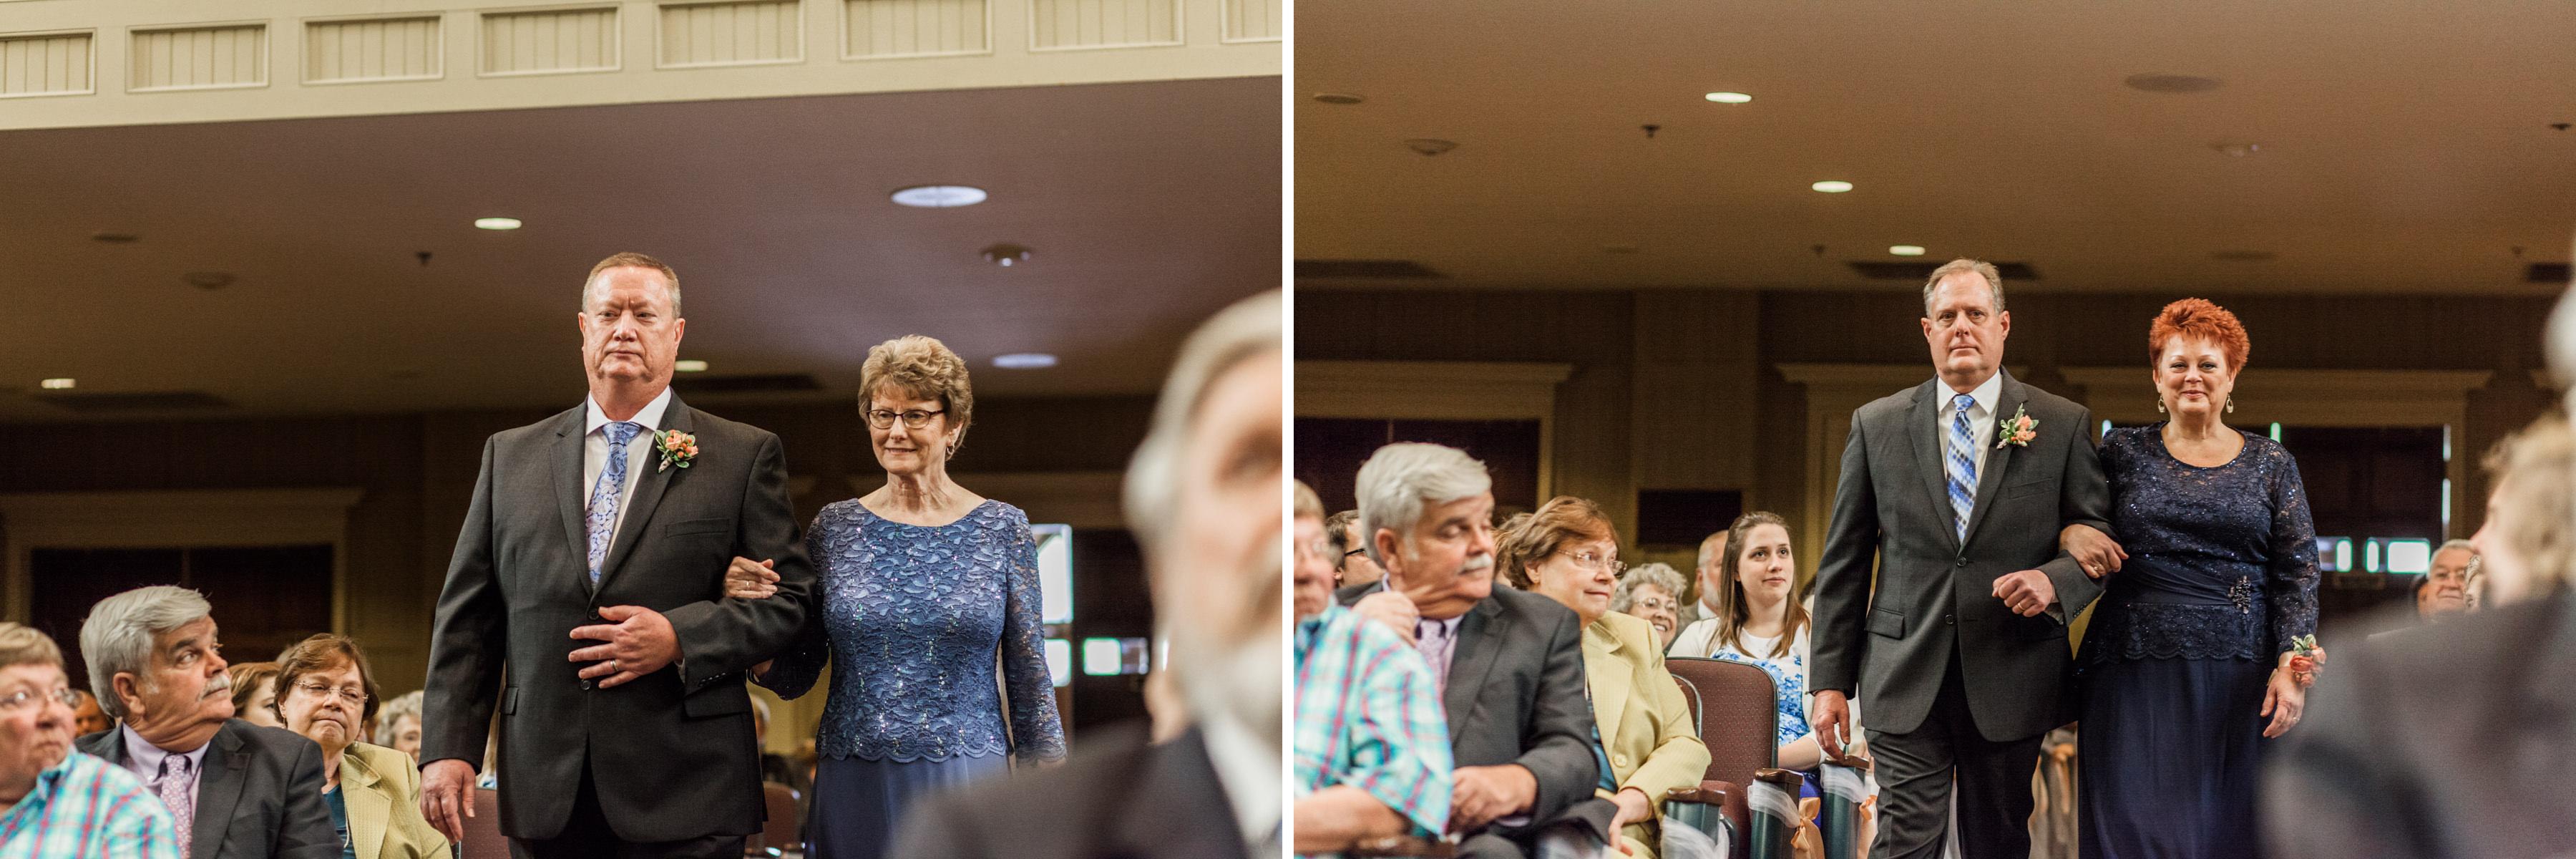 MAULDIN_WEDDING_MONTGOMERY_ALABAMA_WEDDING_PHOTOGRAPHY_55-1